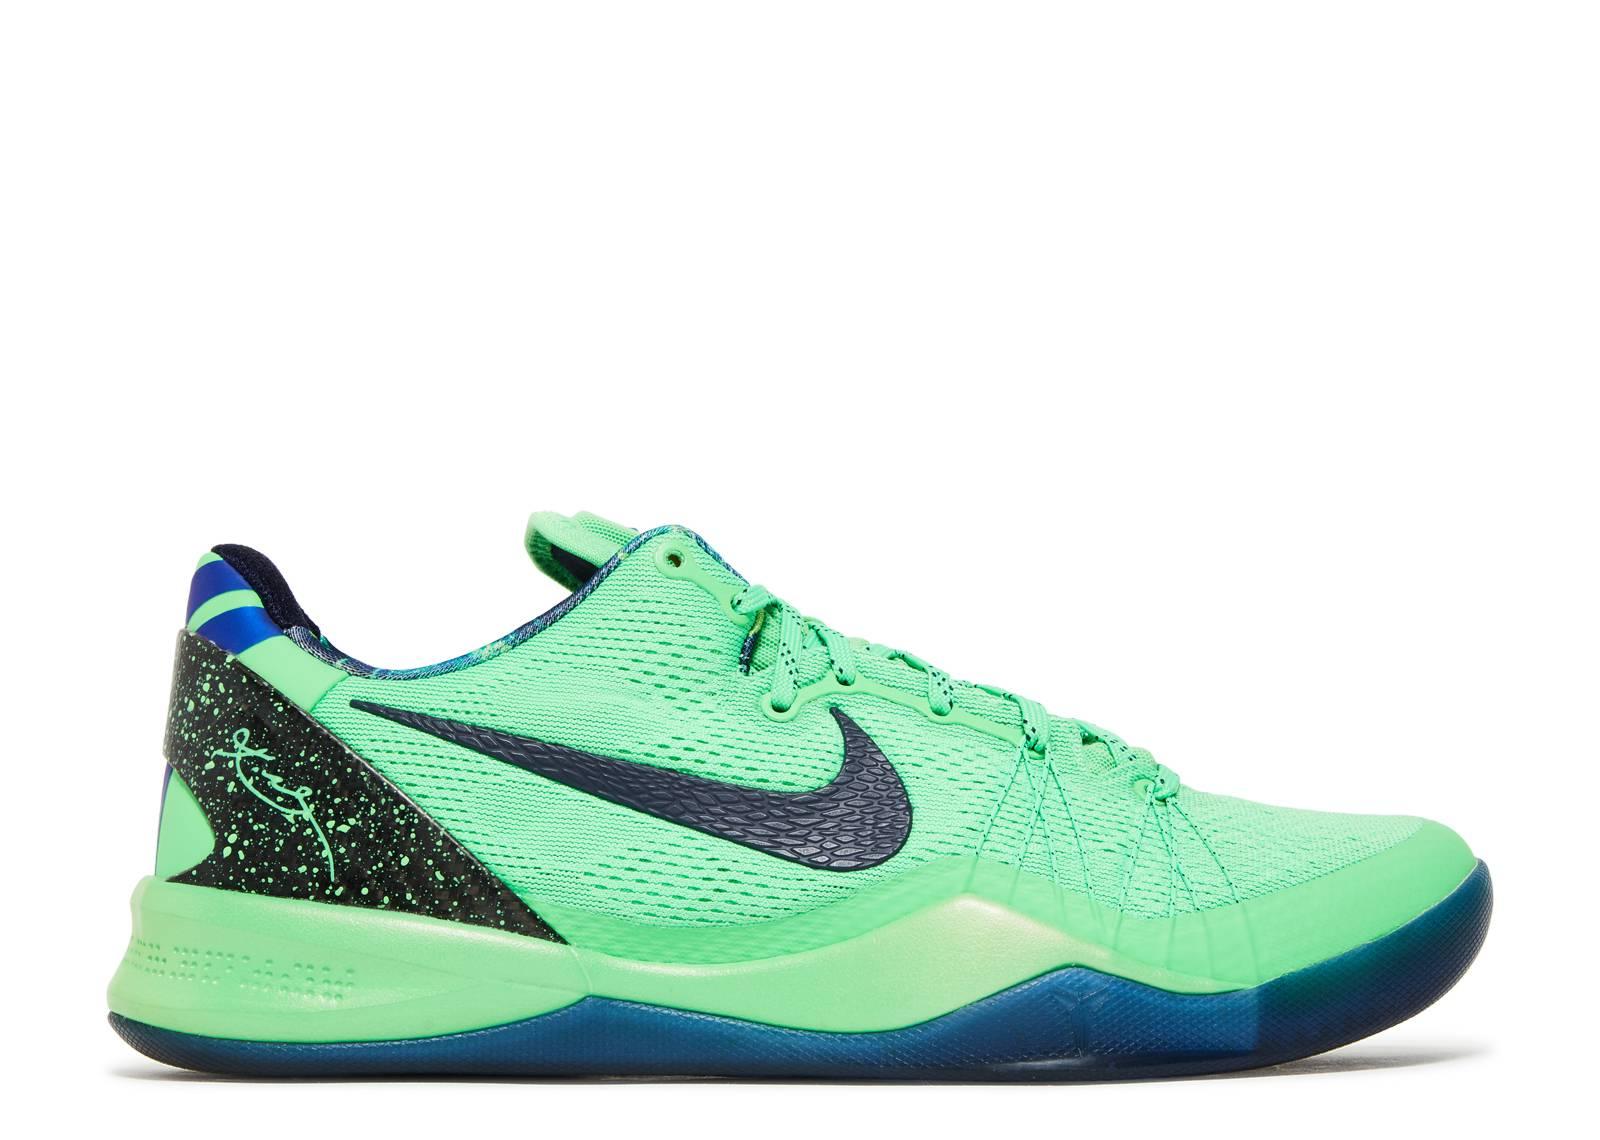 Men's Nike Kobe 8 VIII System Elite Superhero Poison Green Black Sneakers : C89o864